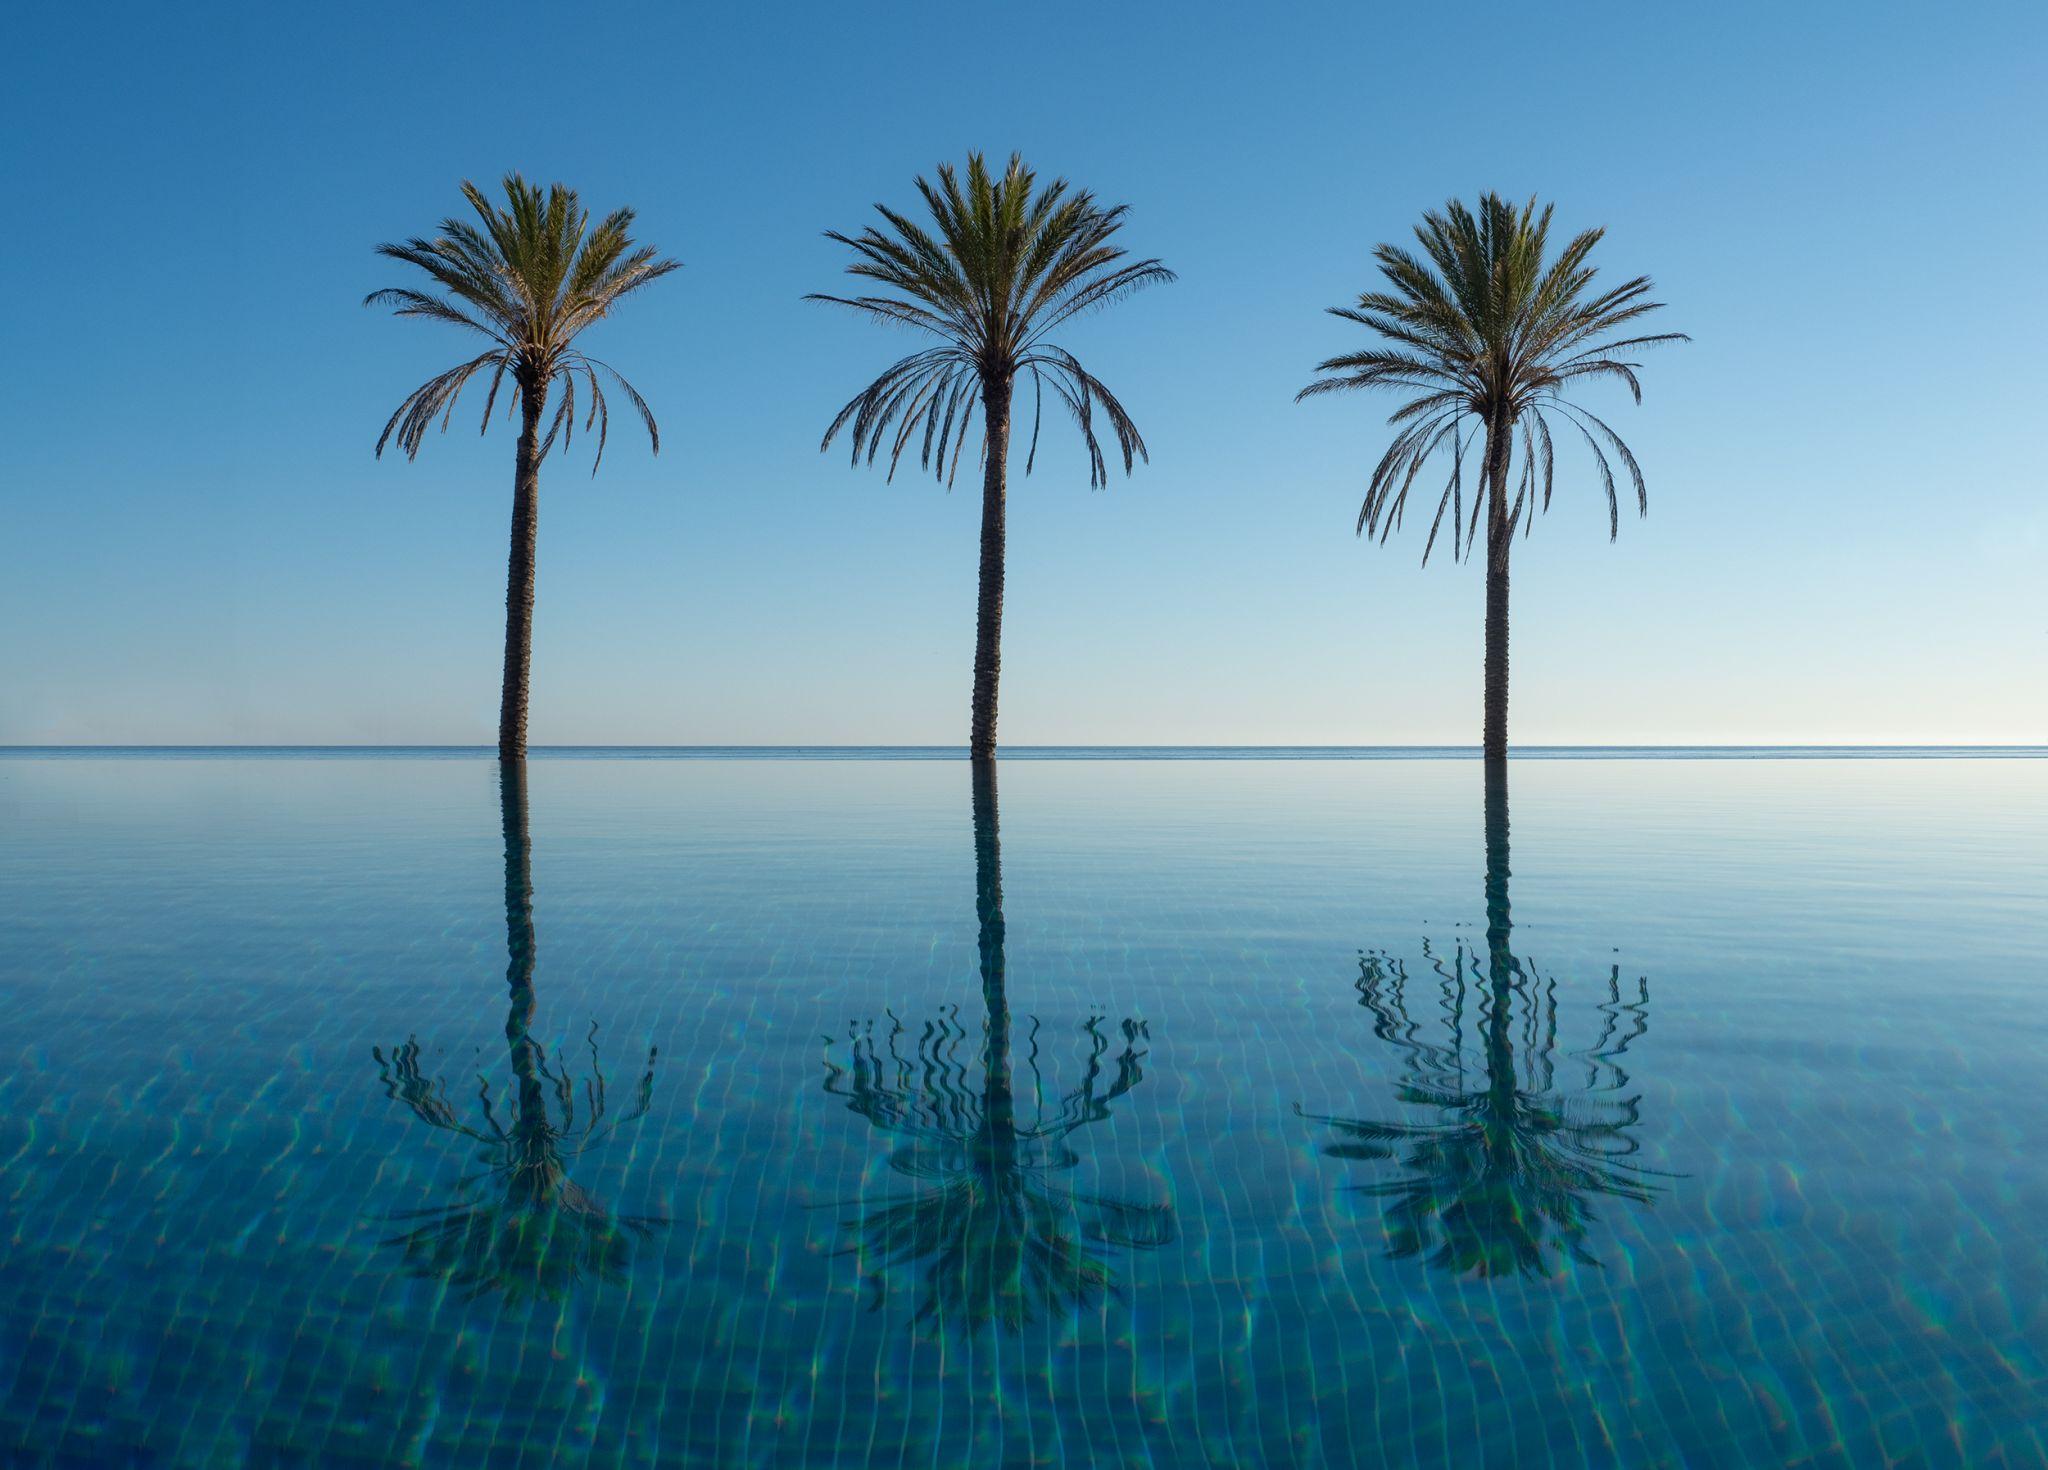 Beach Club Estrella del Mar, Spain